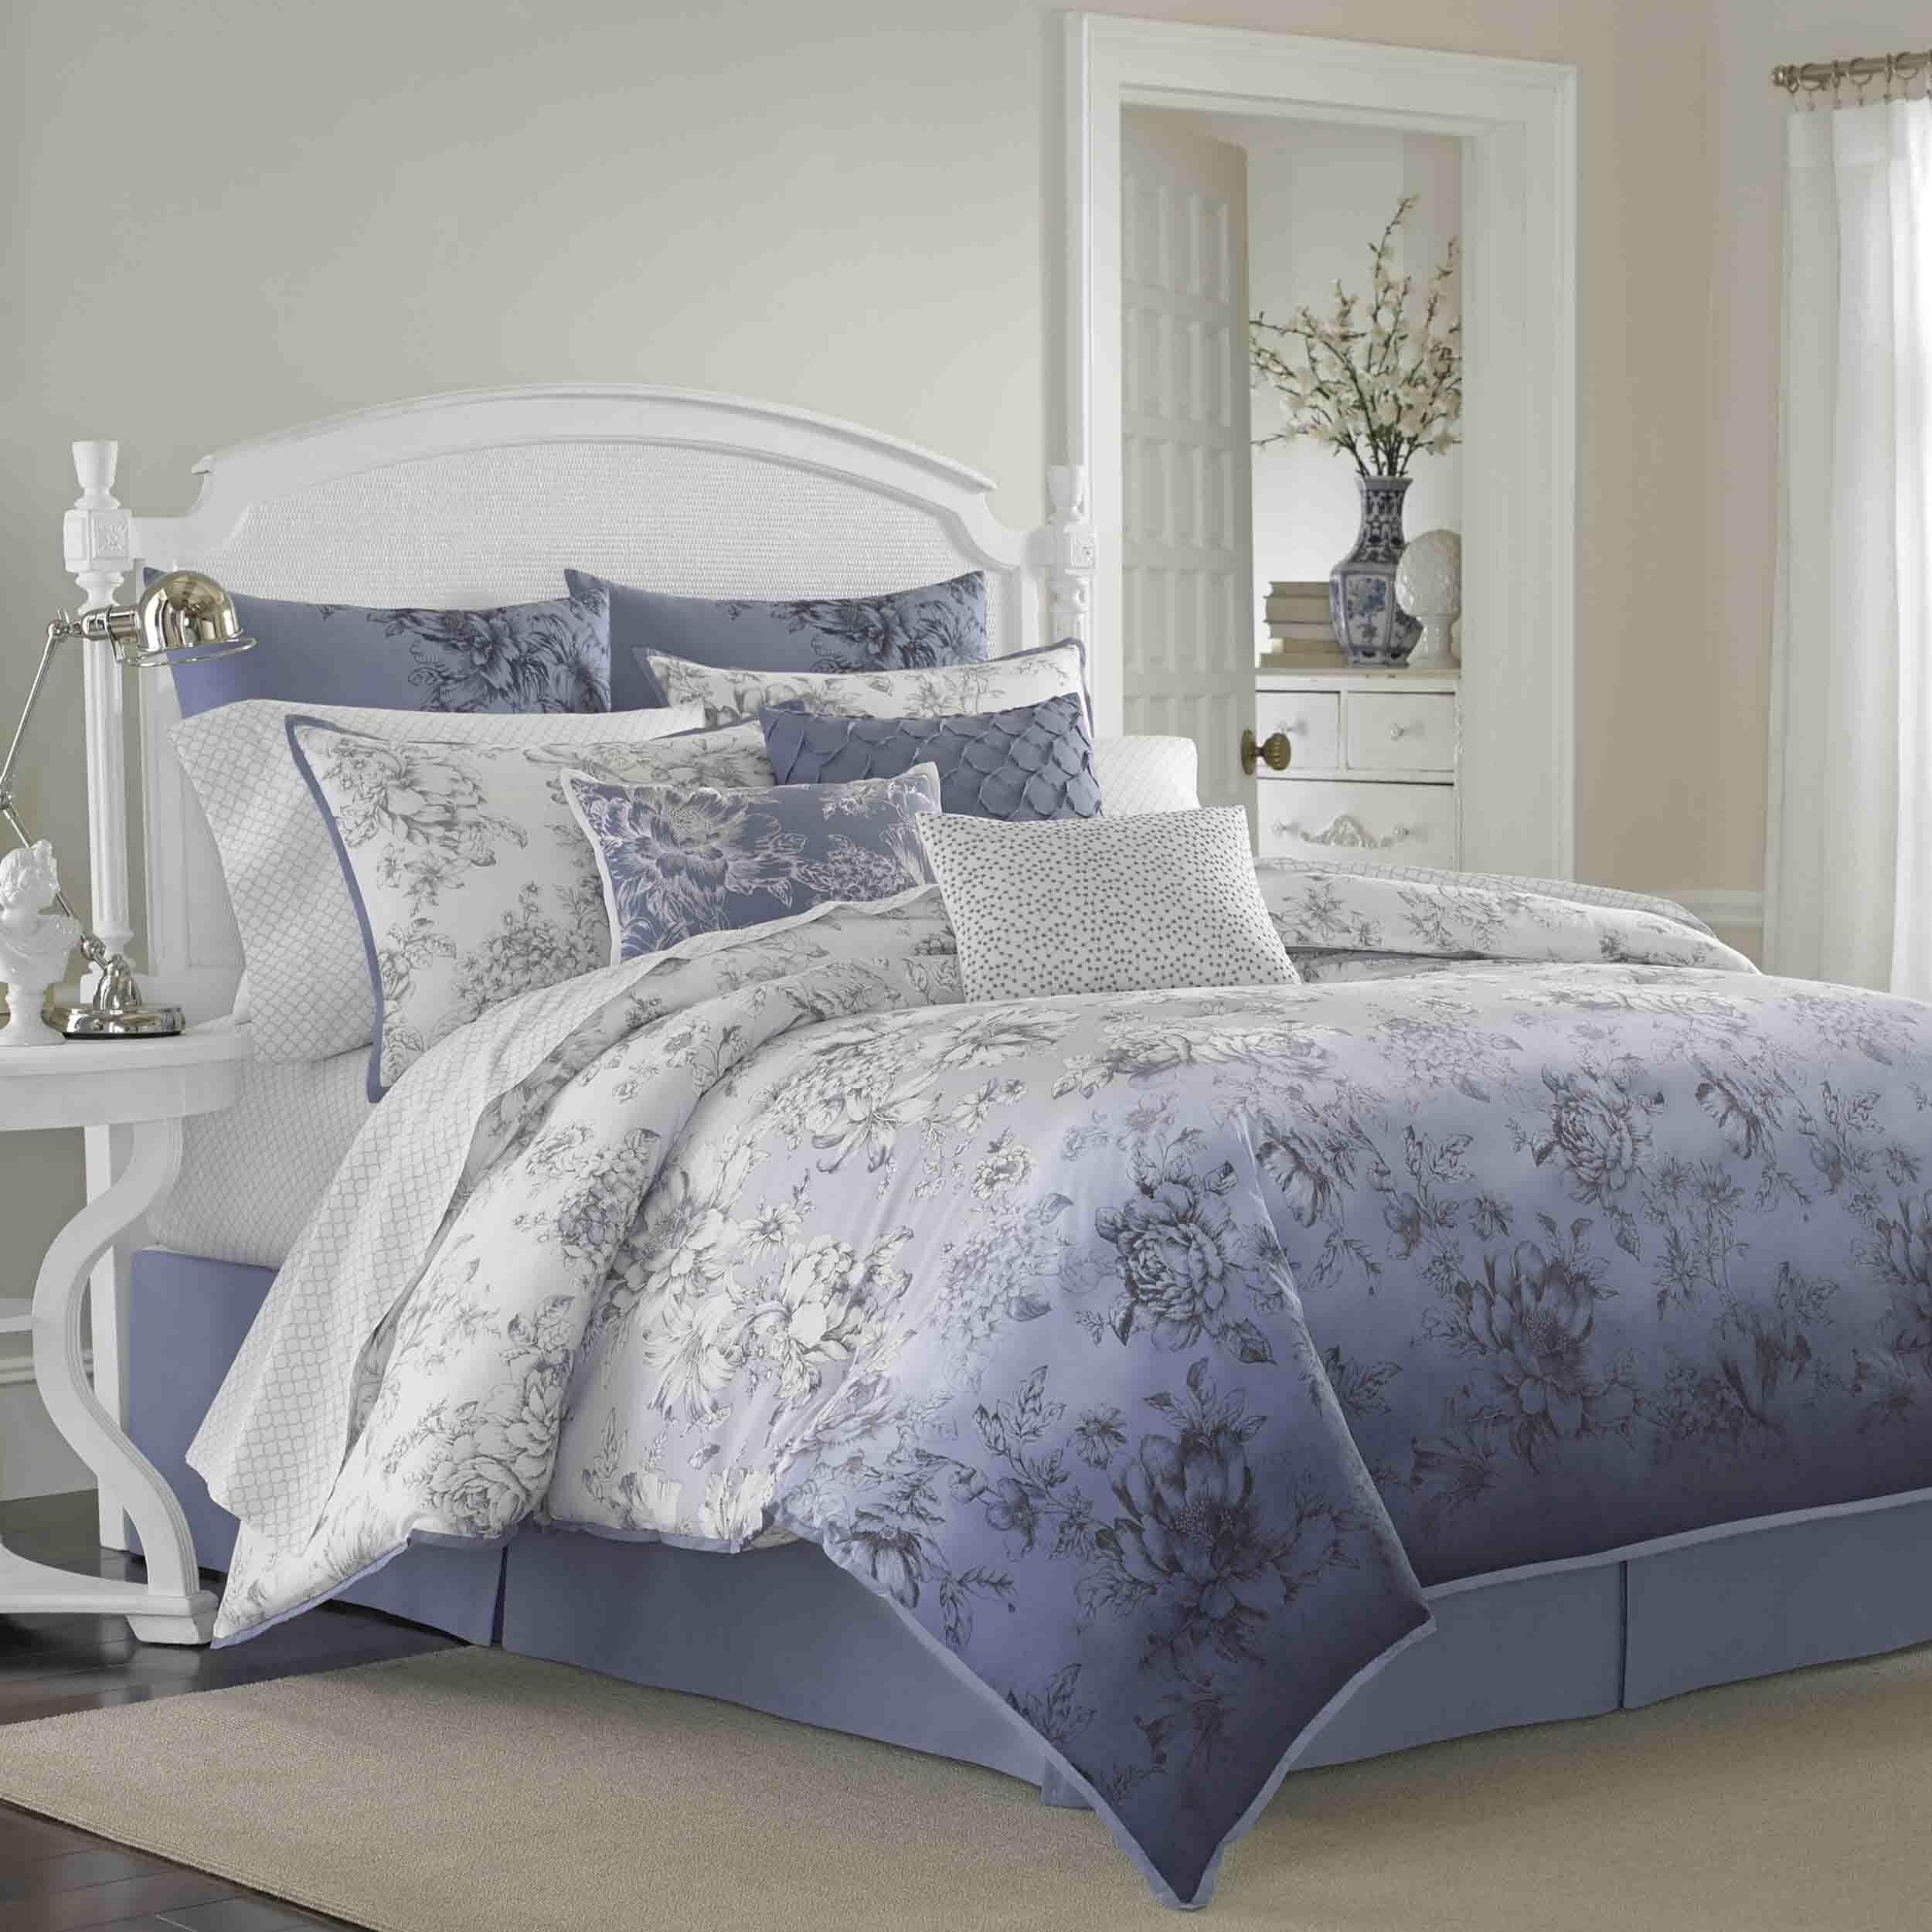 Laura Ashley Home Delphine Comforter Set Reviews Wayfair